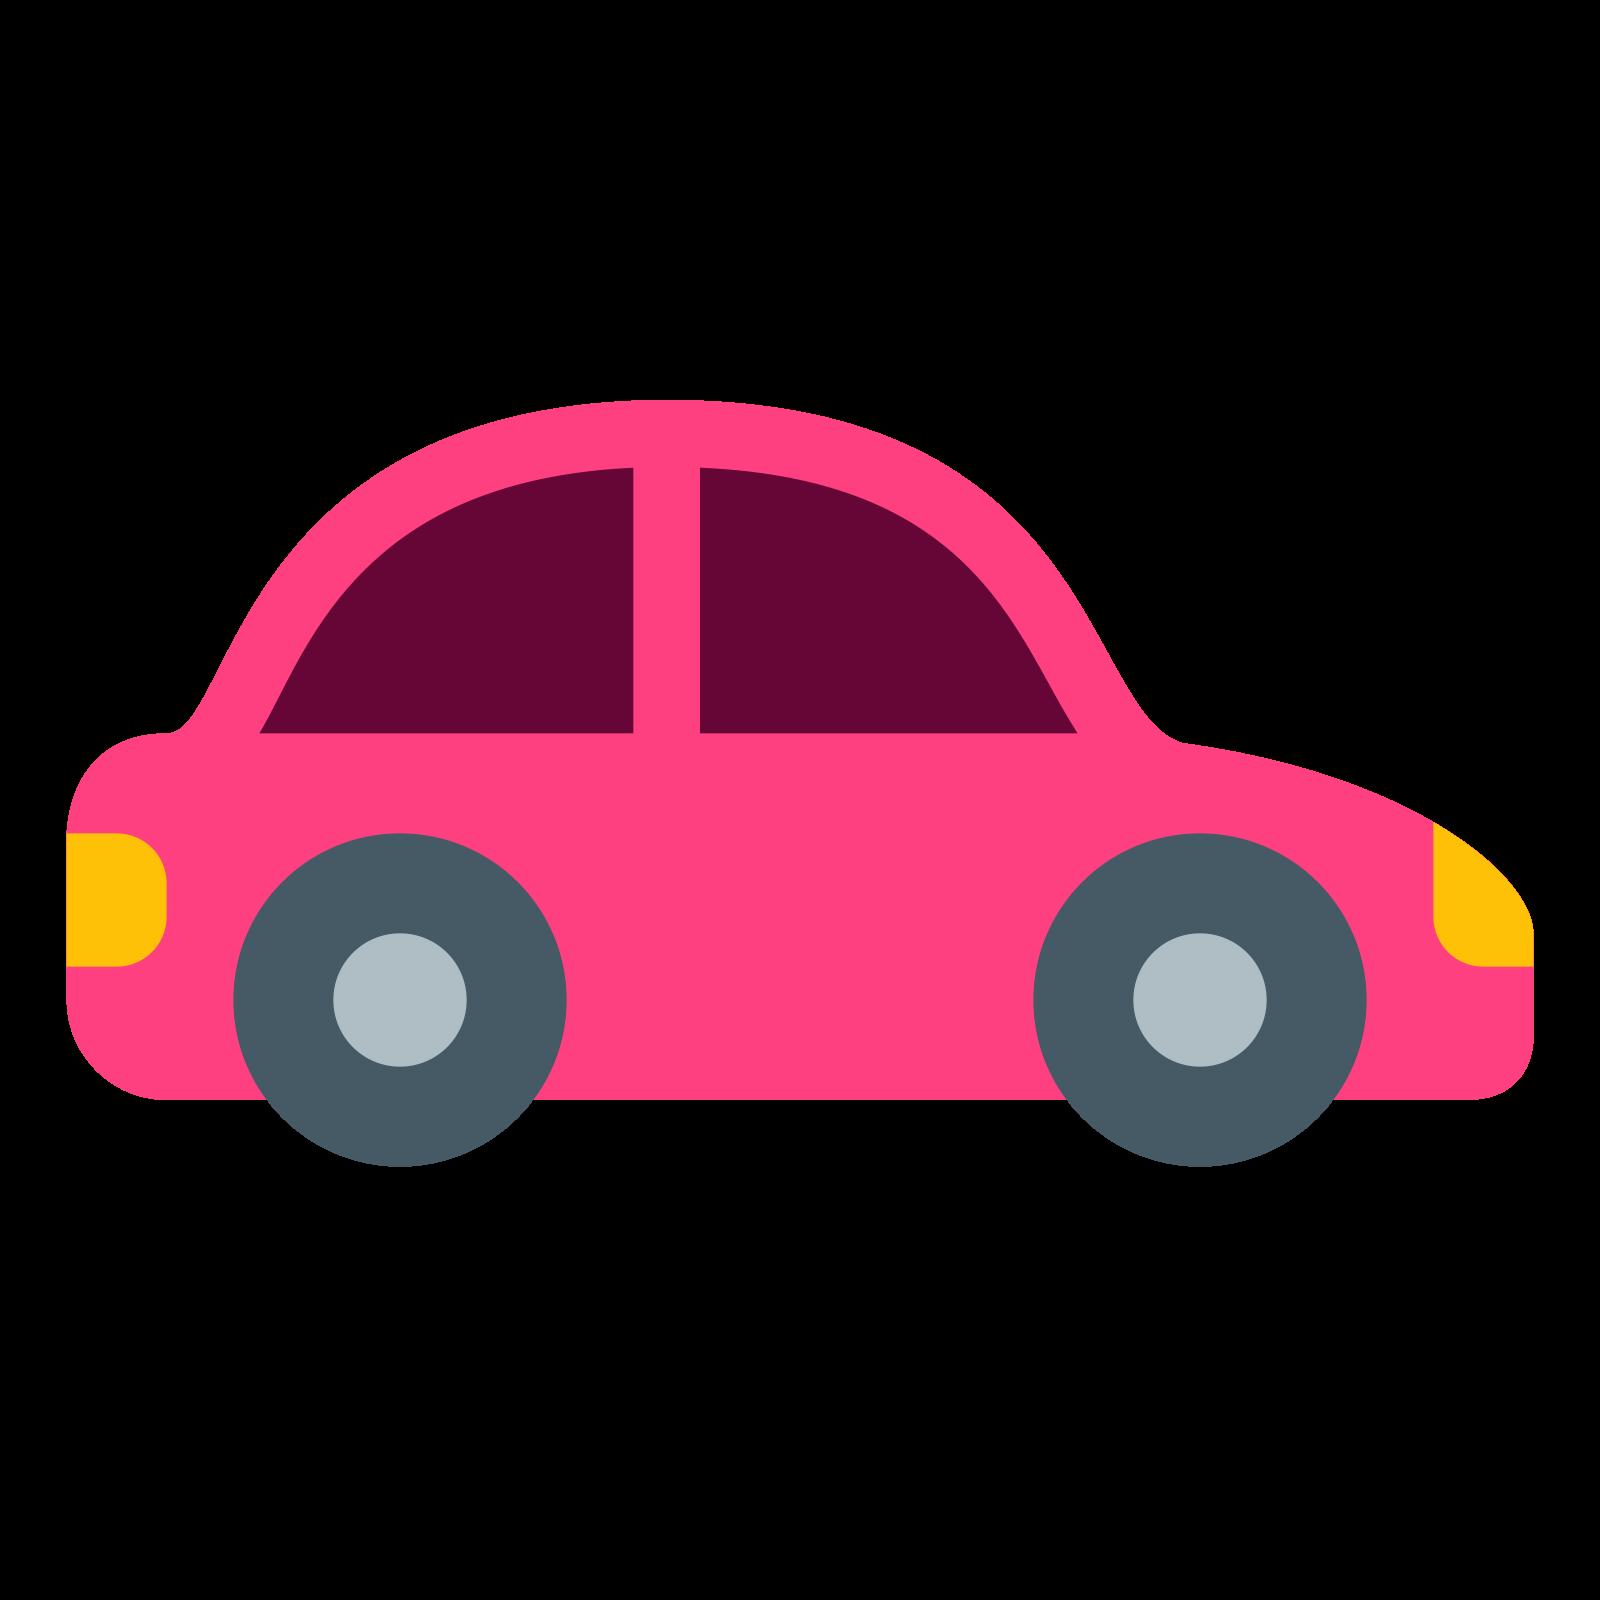 Computer icons emoji traffic. Driving clipart pink car